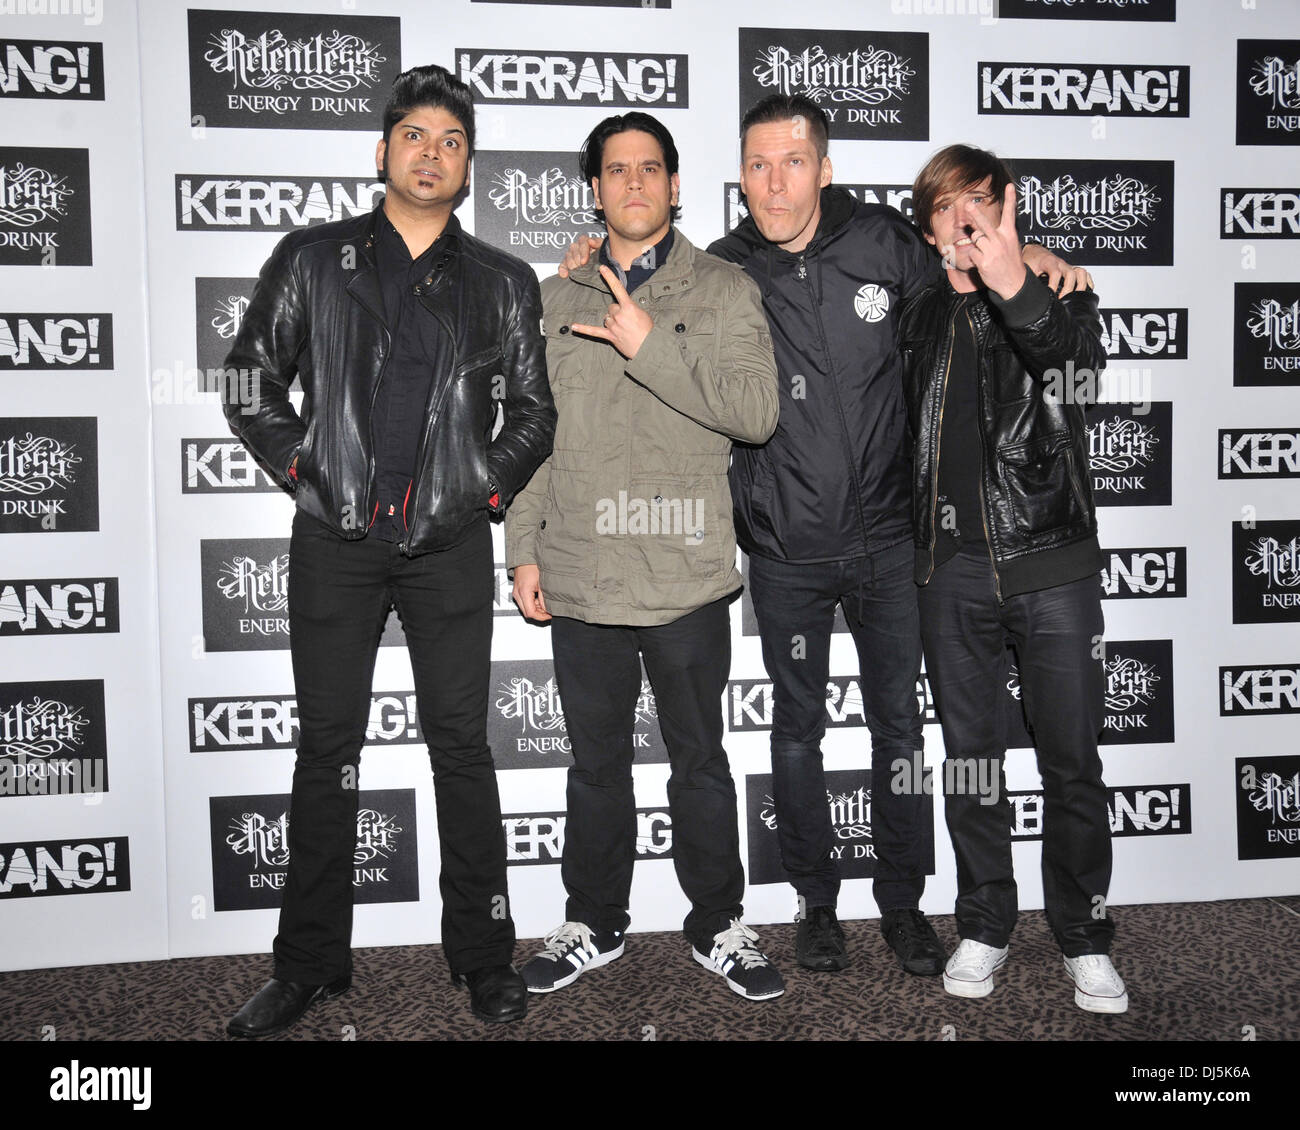 Ian D'Sa, Jonathan Gallant, Aaron Solowoniuk and Benjamin Kowalewicz of Billy Talent Kerrang! Awards held at the Brewery - Arrivals. London, England - 07.06.12 - Stock Image